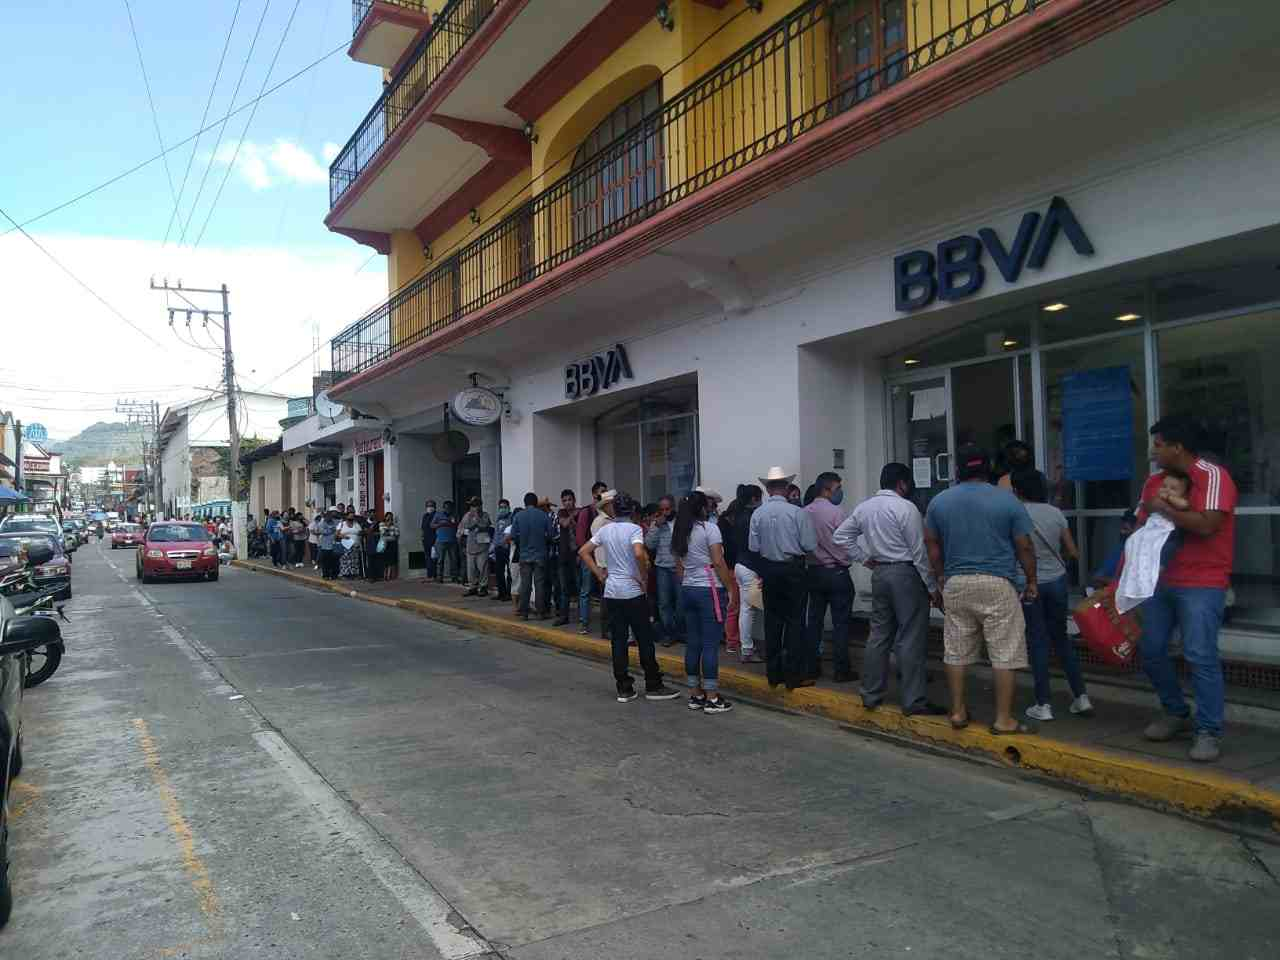 SIGUEN AGLOMERACIONES EN HUATUSCO